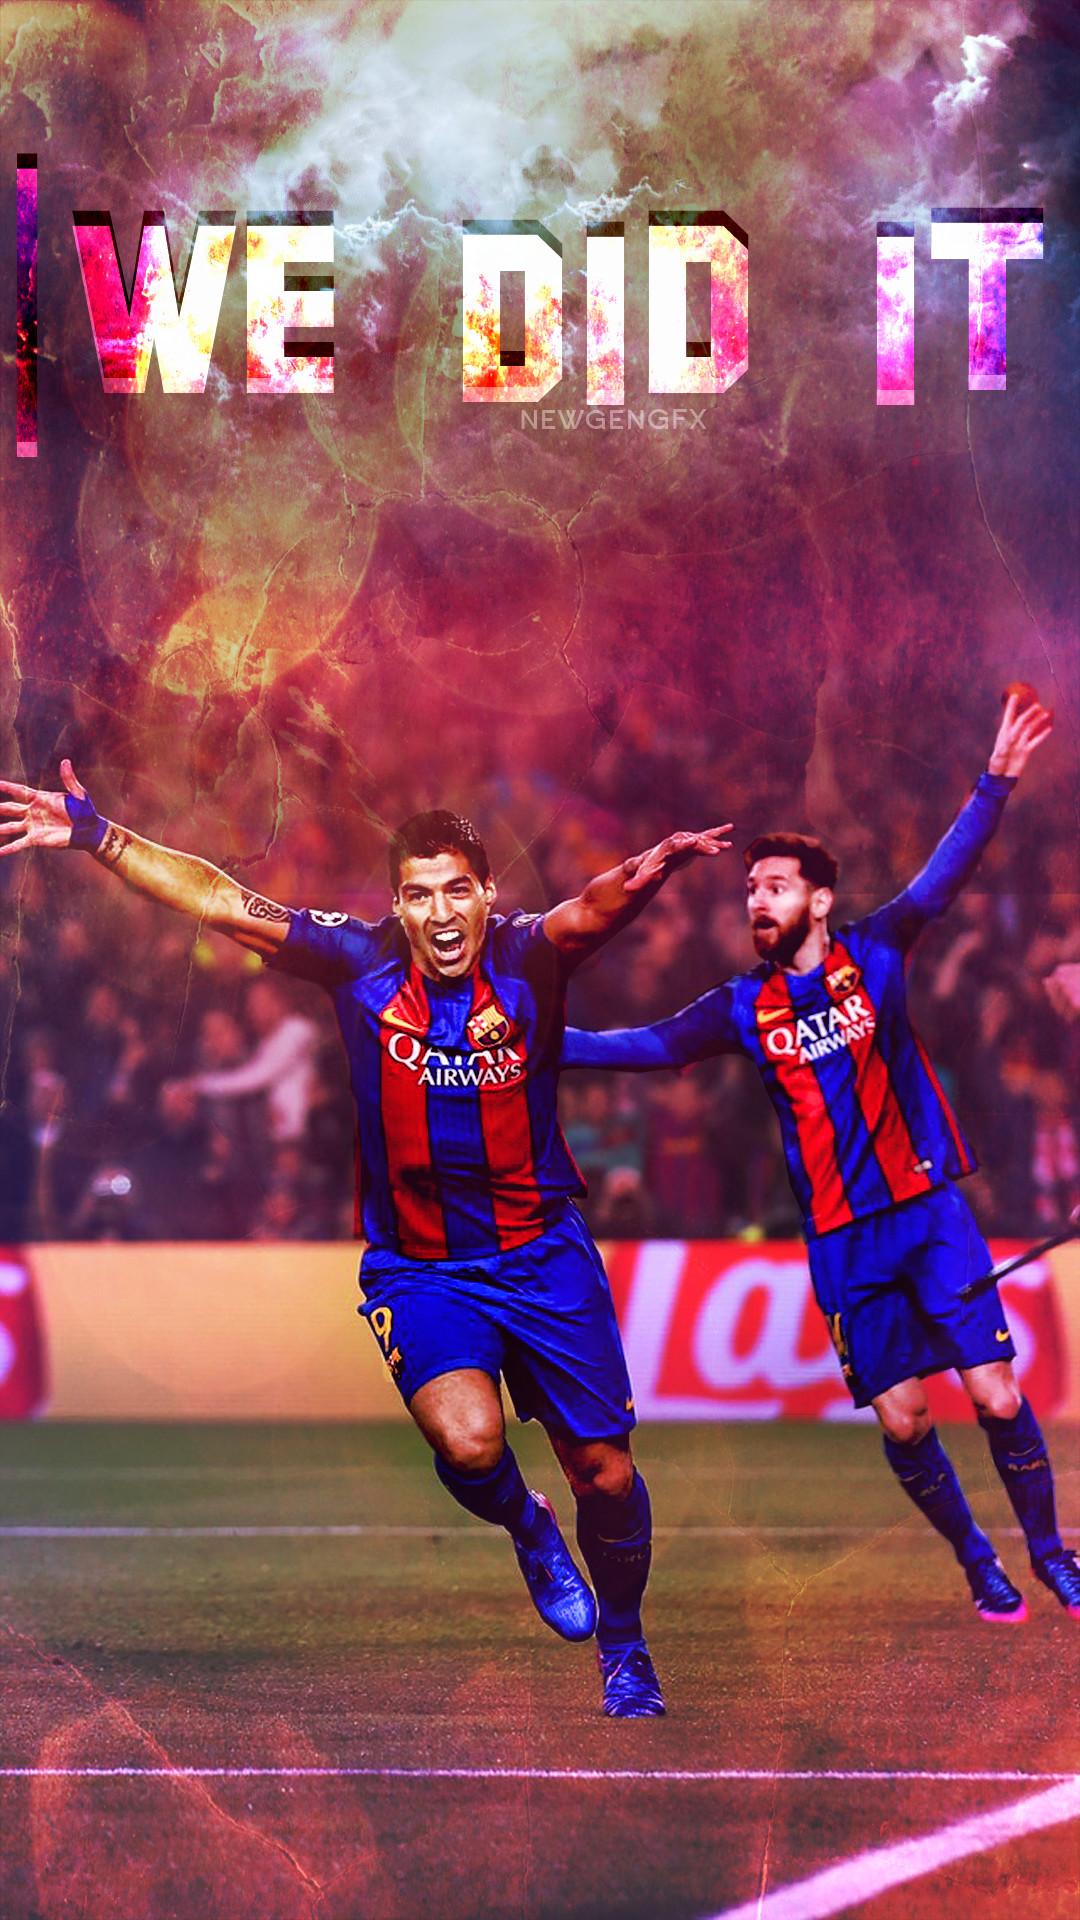 Luis Suarez-Leo Messi Mobile wallpaper #Luis_suarez #Messi #Fcbarcelona